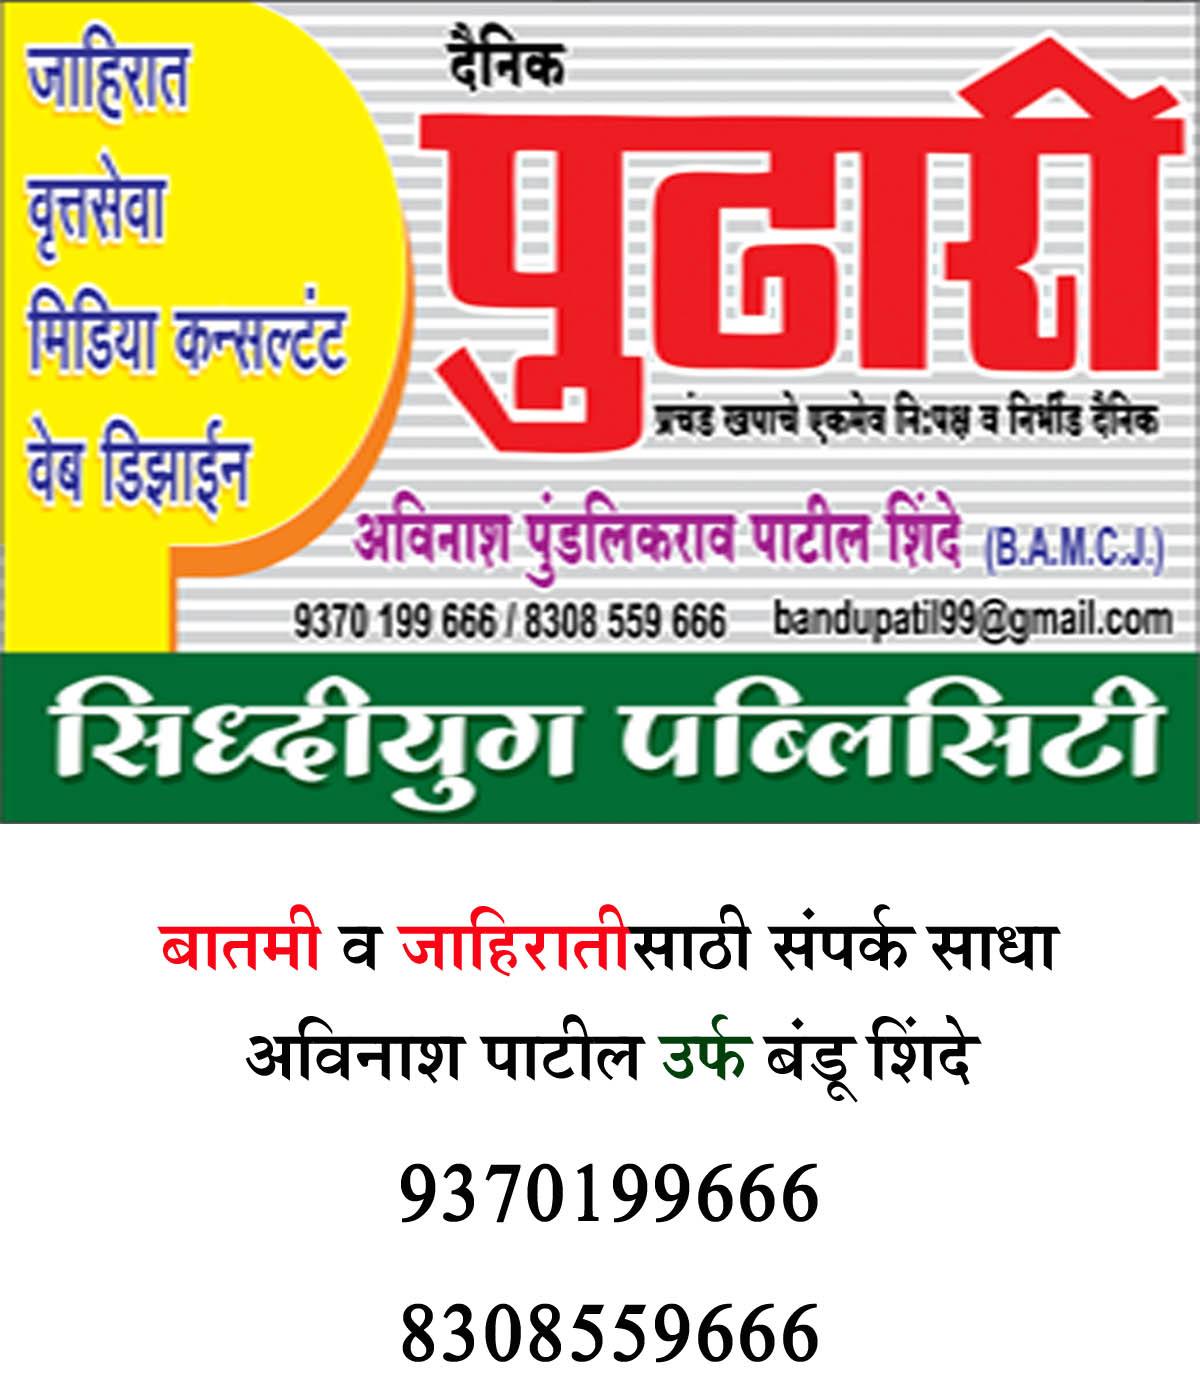 Yeolanews News from Yeola Nashik Maharashtra by Avinash P Patil Shinde